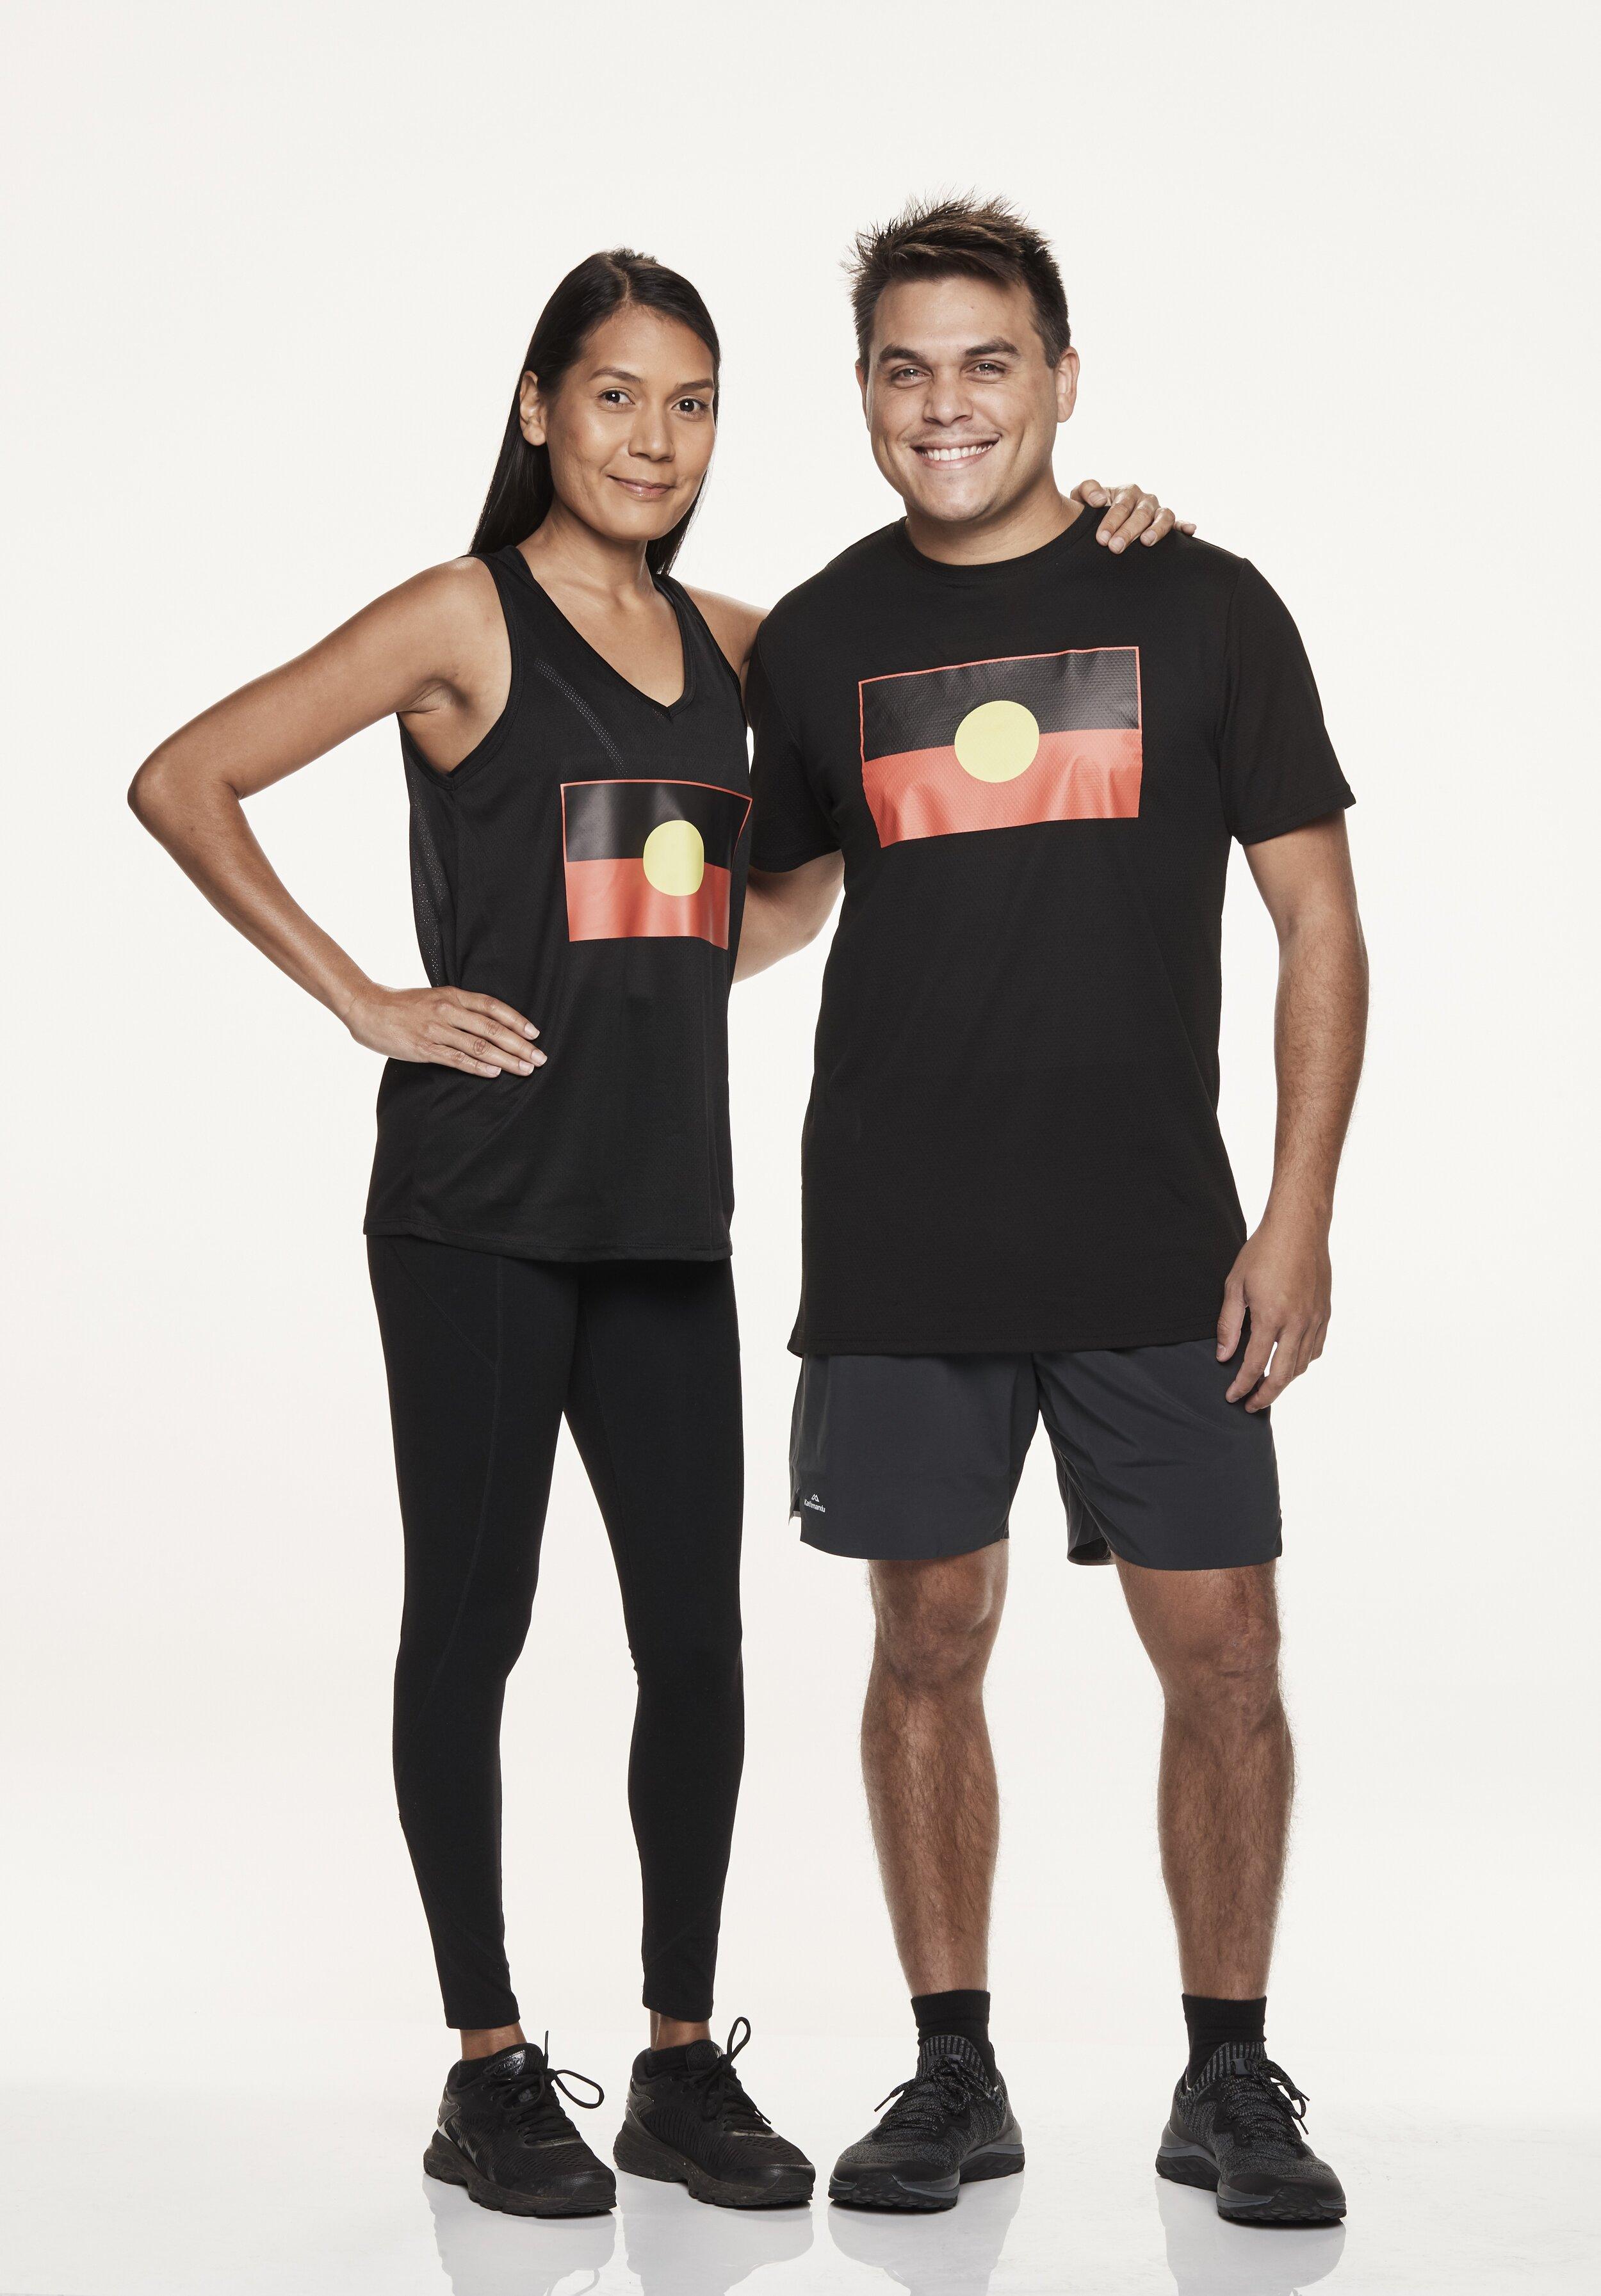 amazing race australia - photo #8